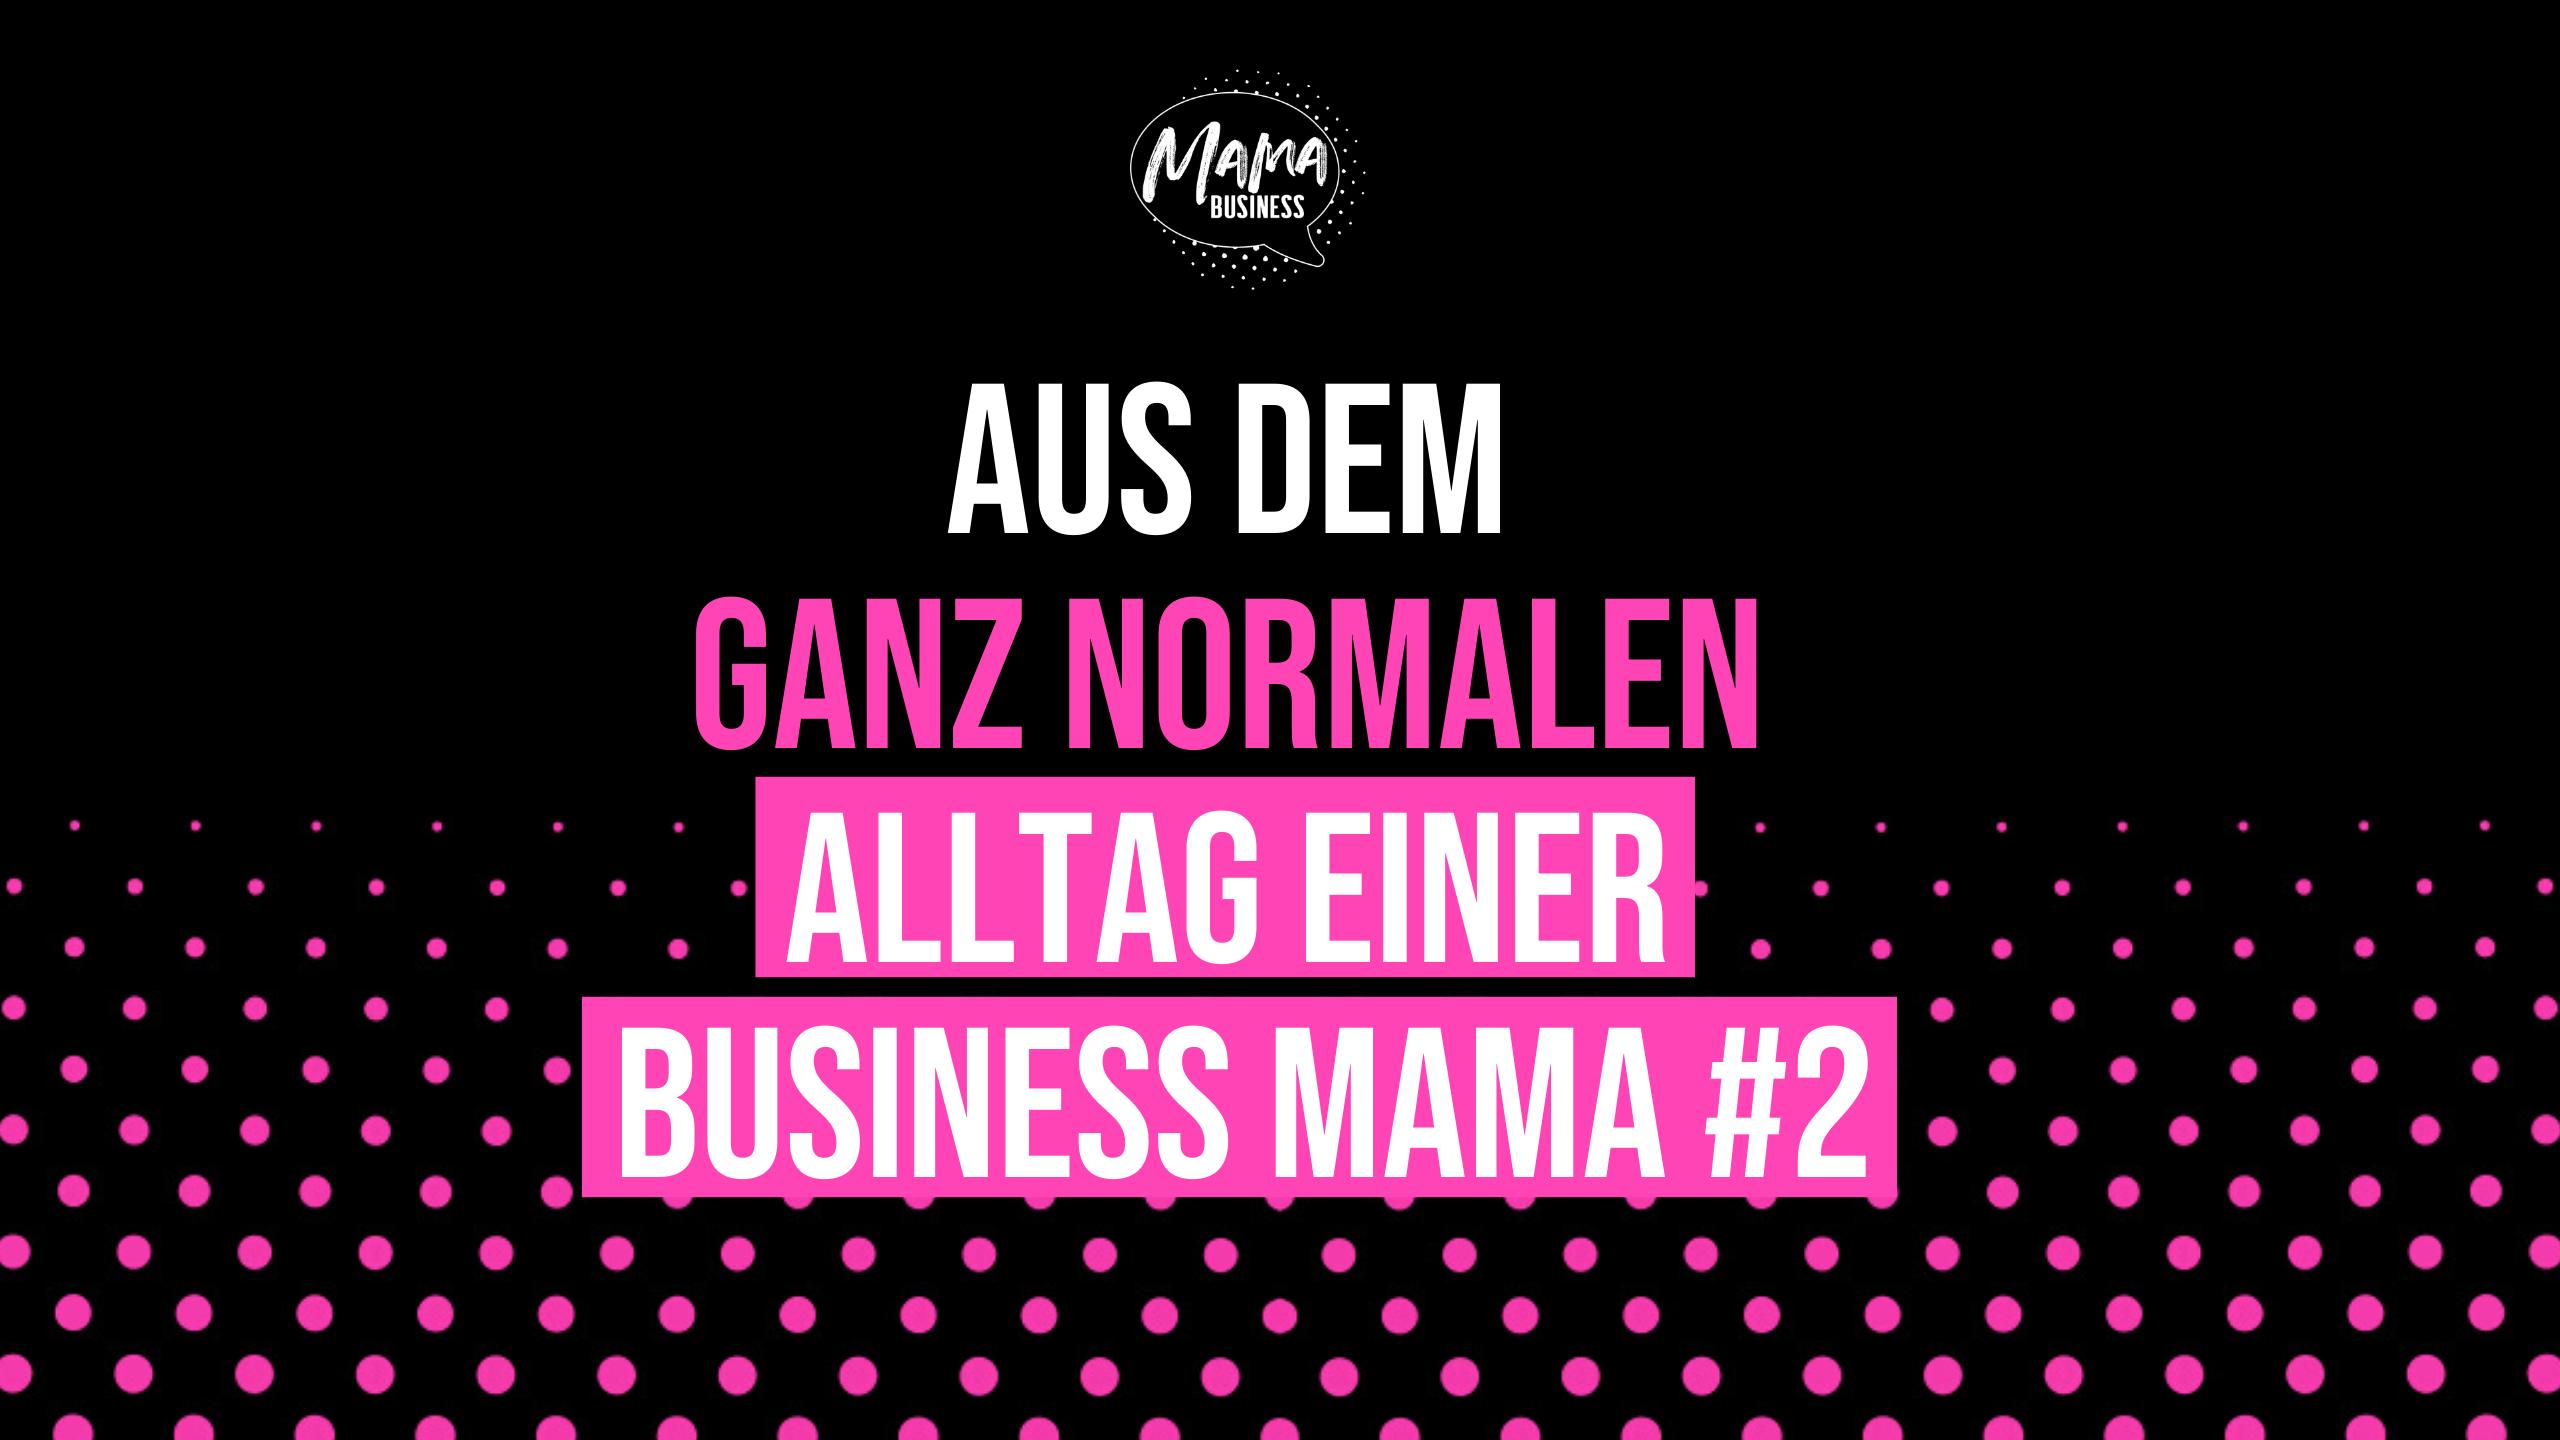 MAMA BUSINESS - Alltag einer Business Mama #2